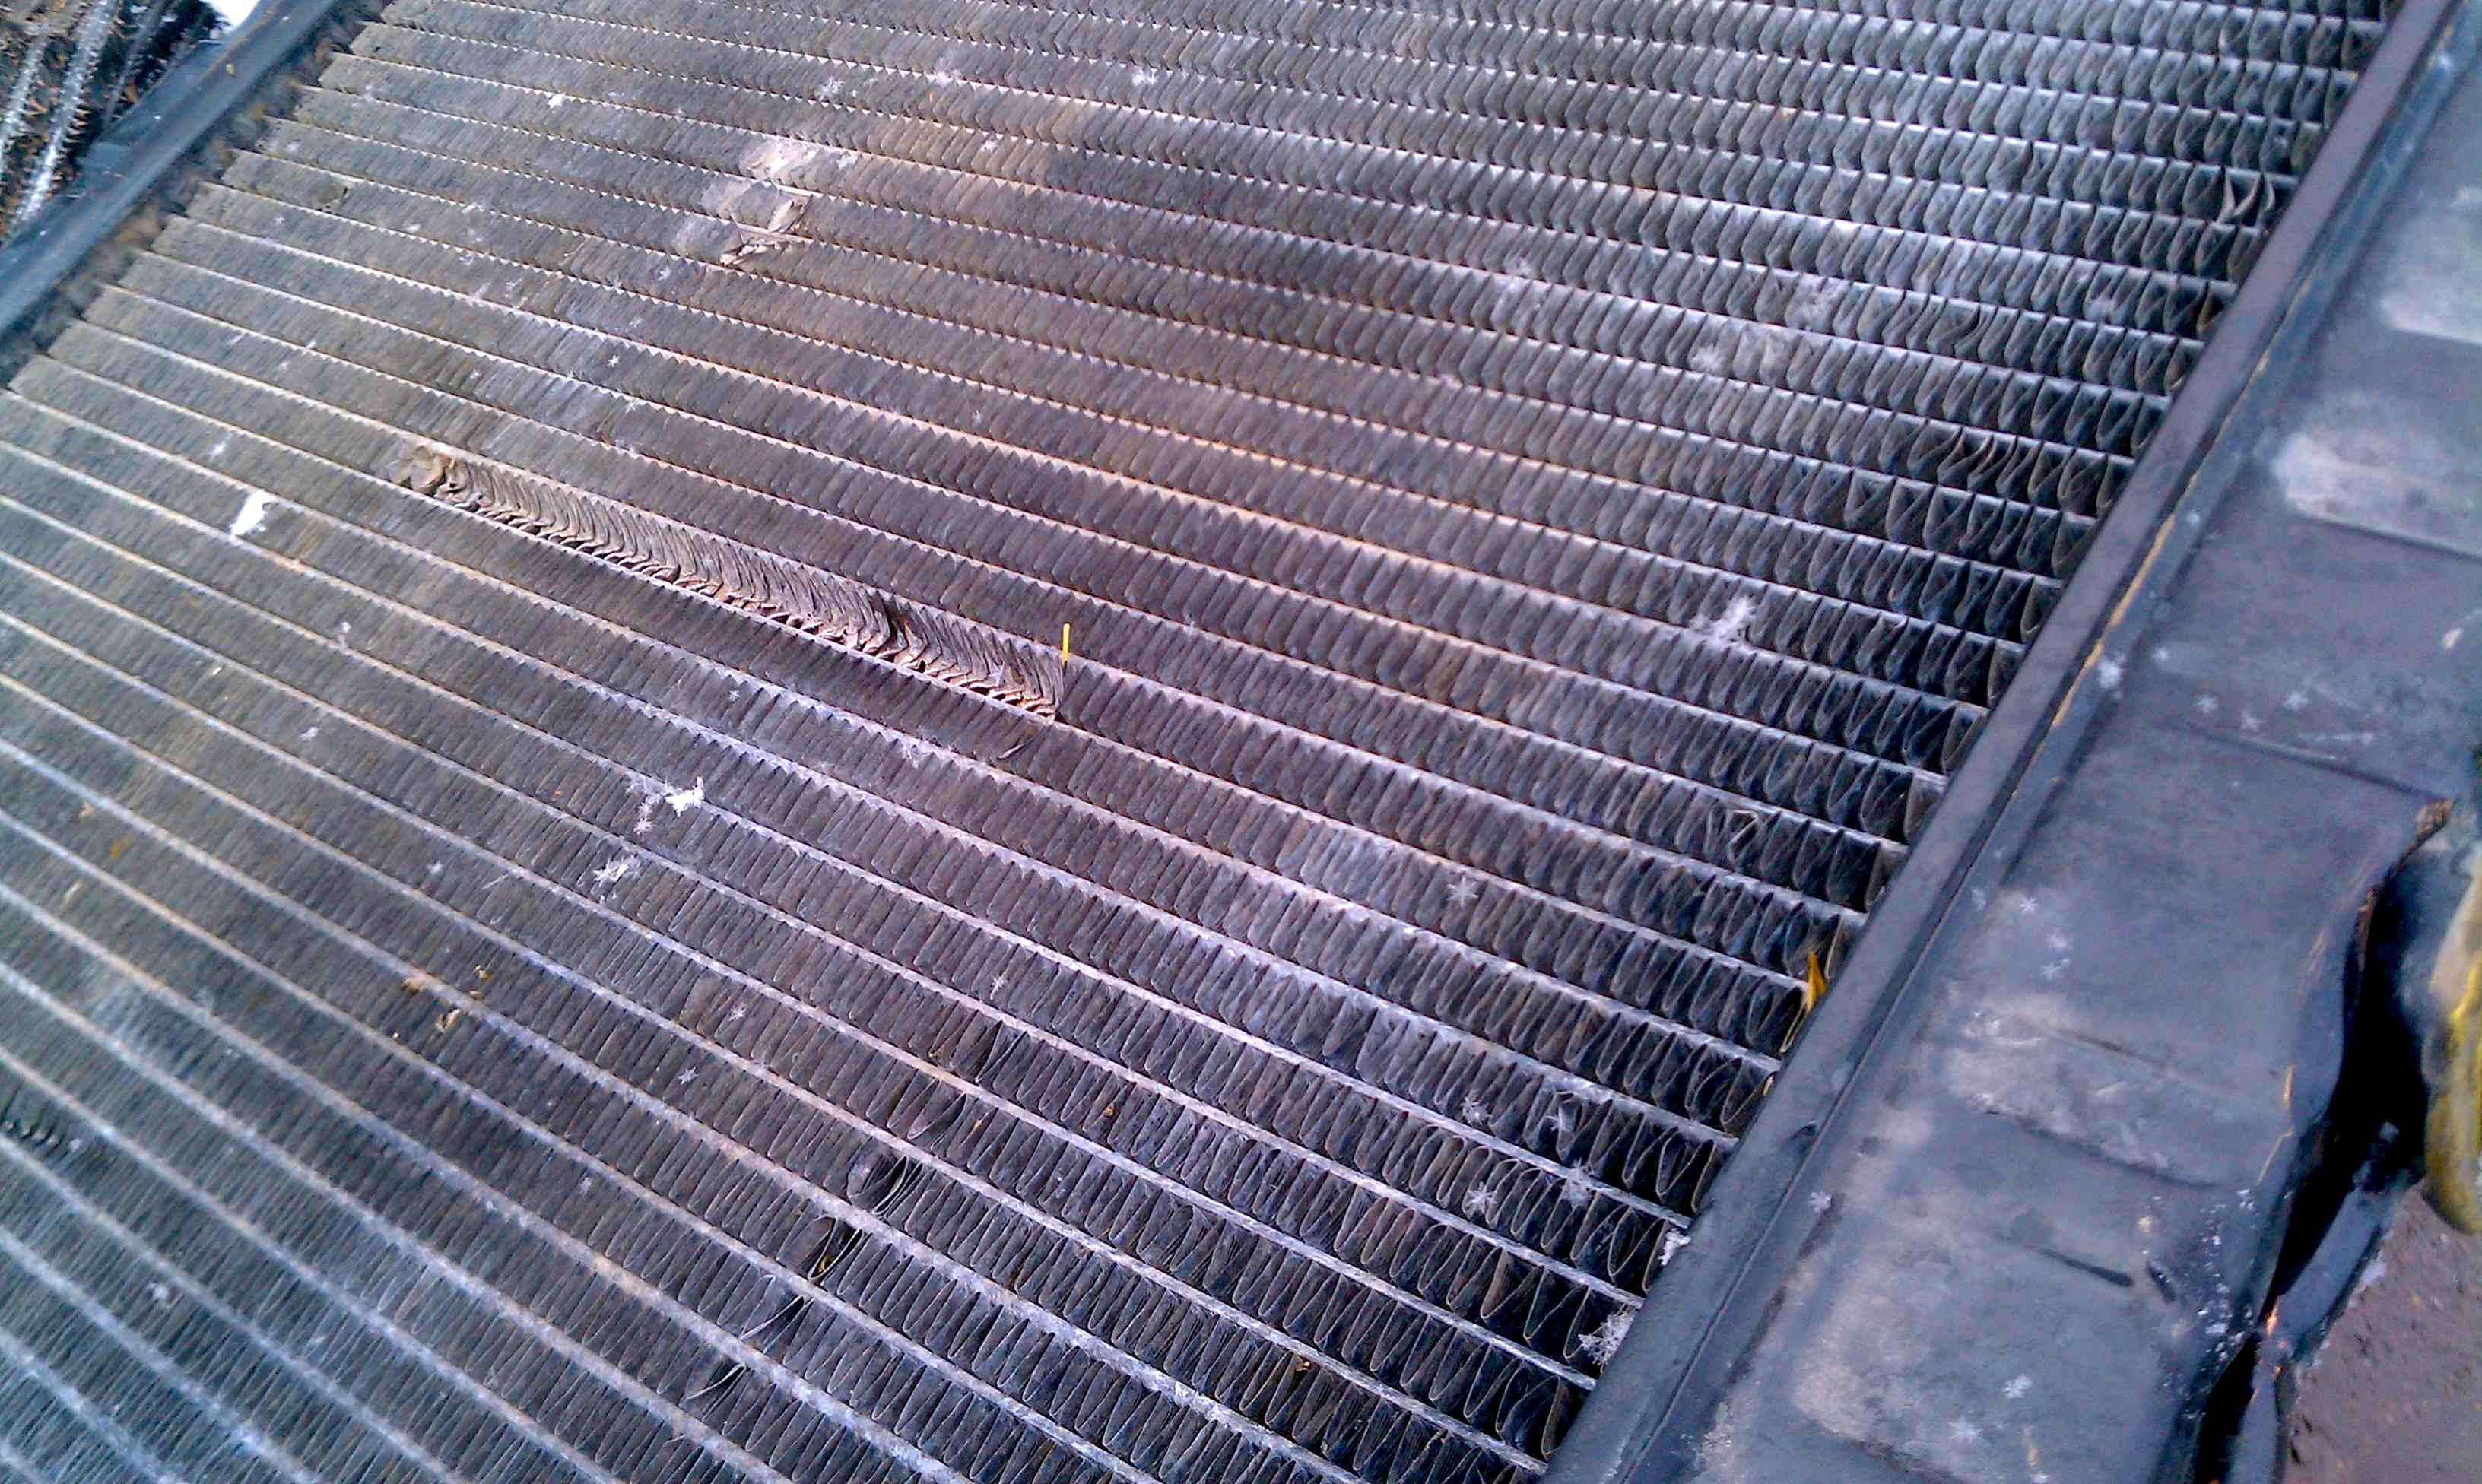 Radiators / Dirty